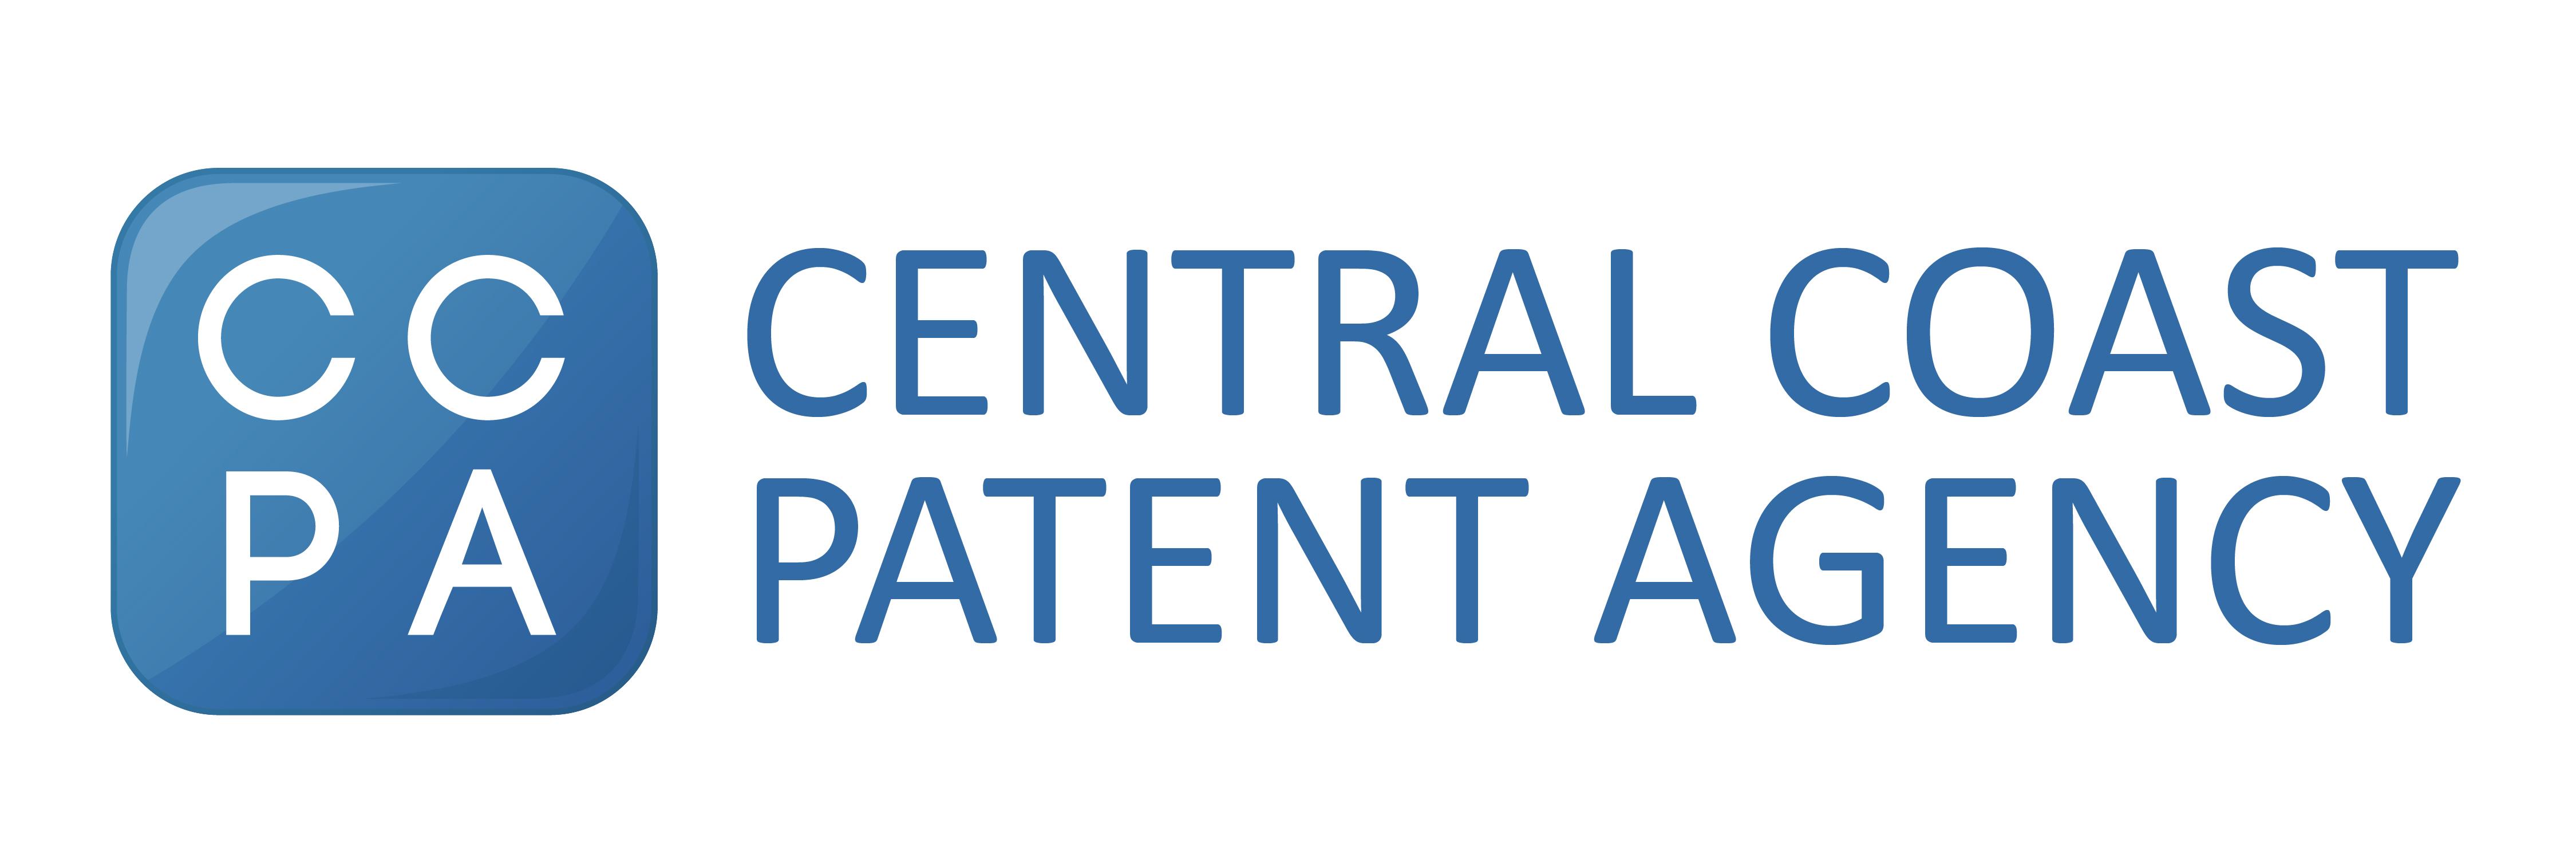 Central Coast Patent Agency - Logo-05